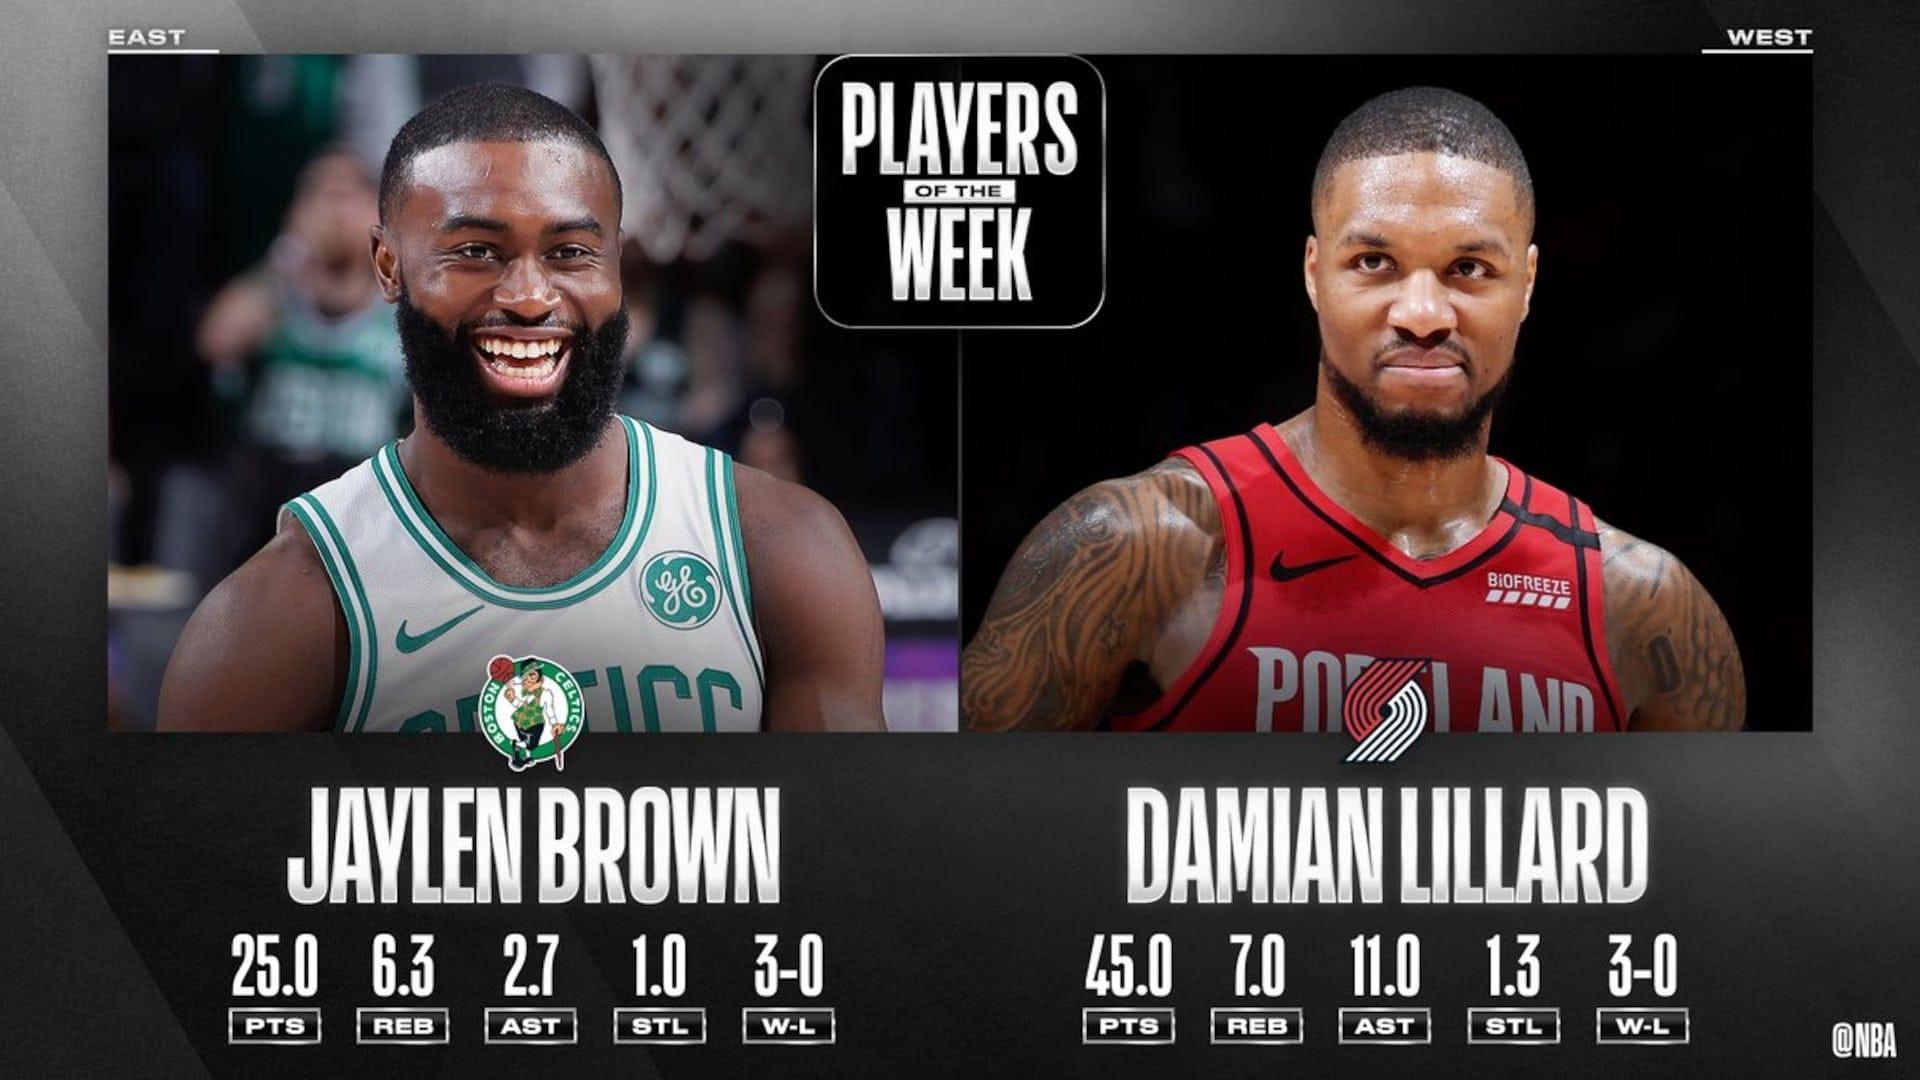 Jaylen Brown, Damian Lillard named NBA Players of the Week